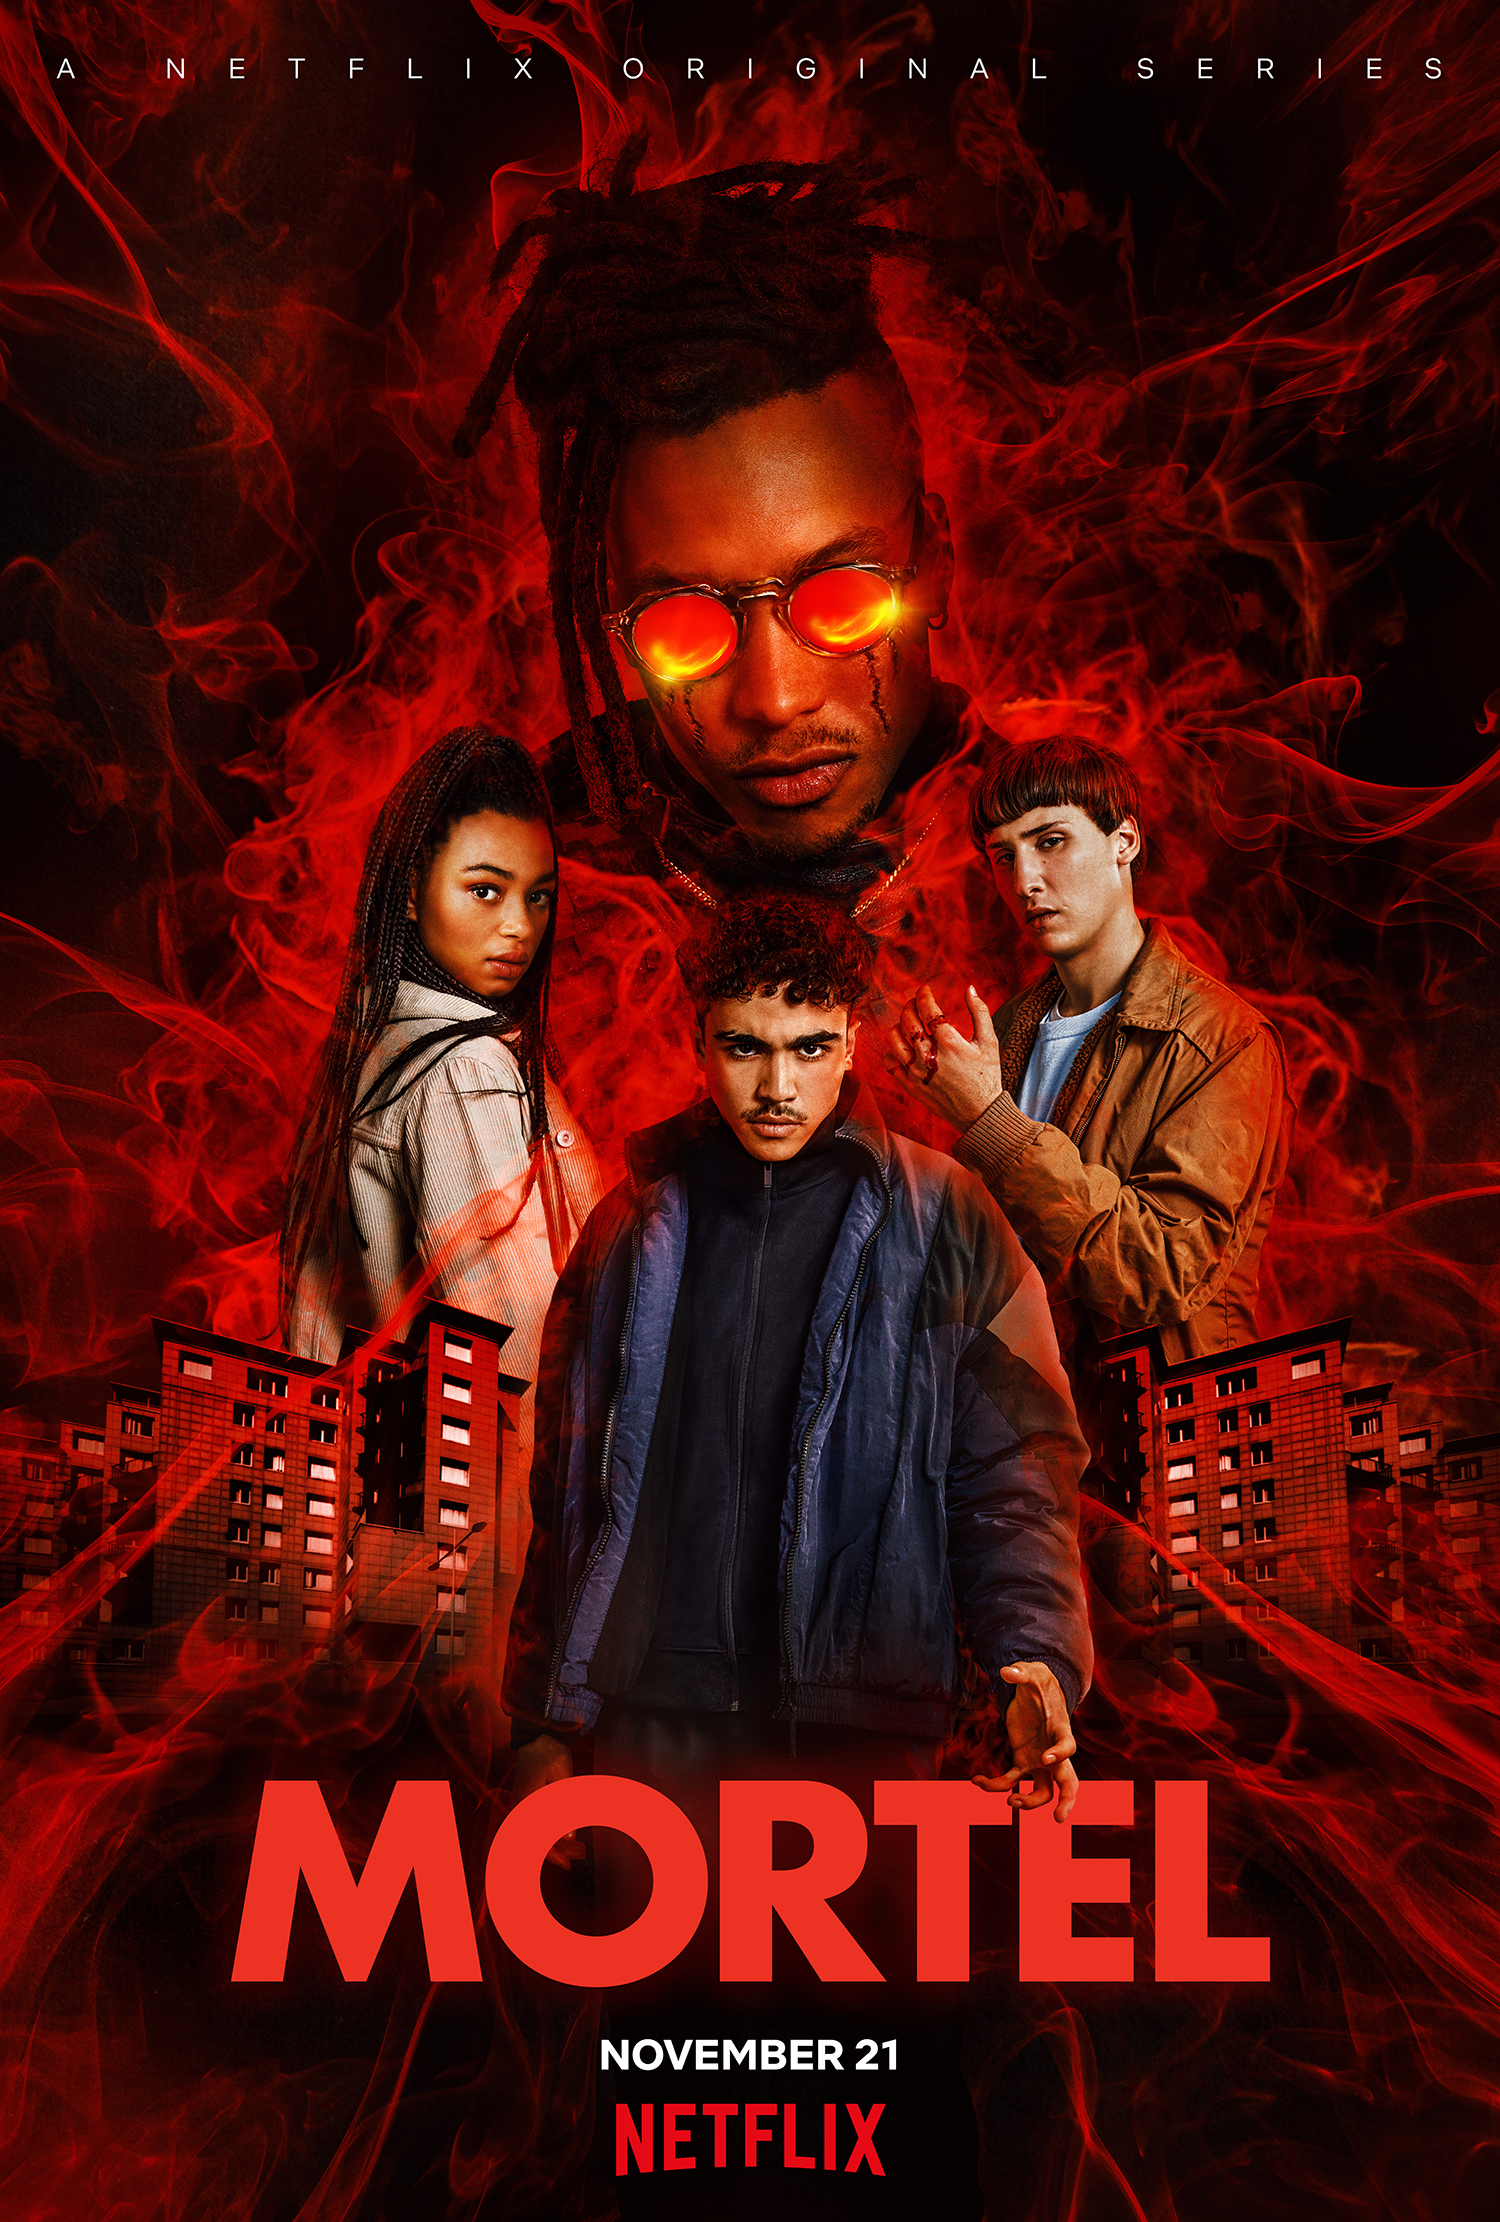 Mortal - Poster.jpg